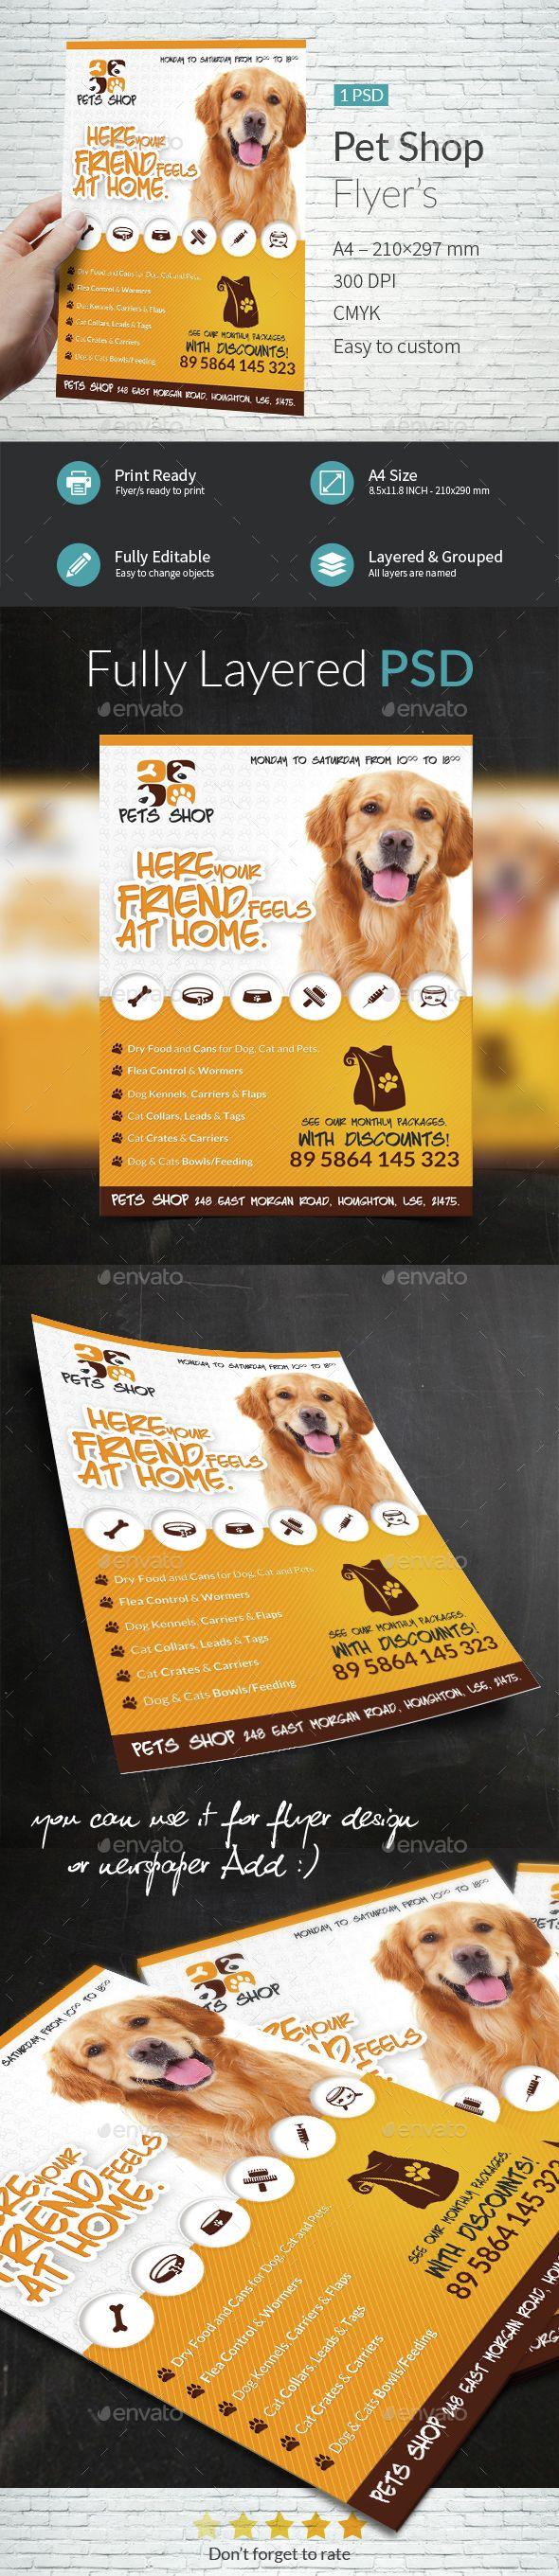 Pet Shop A4 Flyer Template